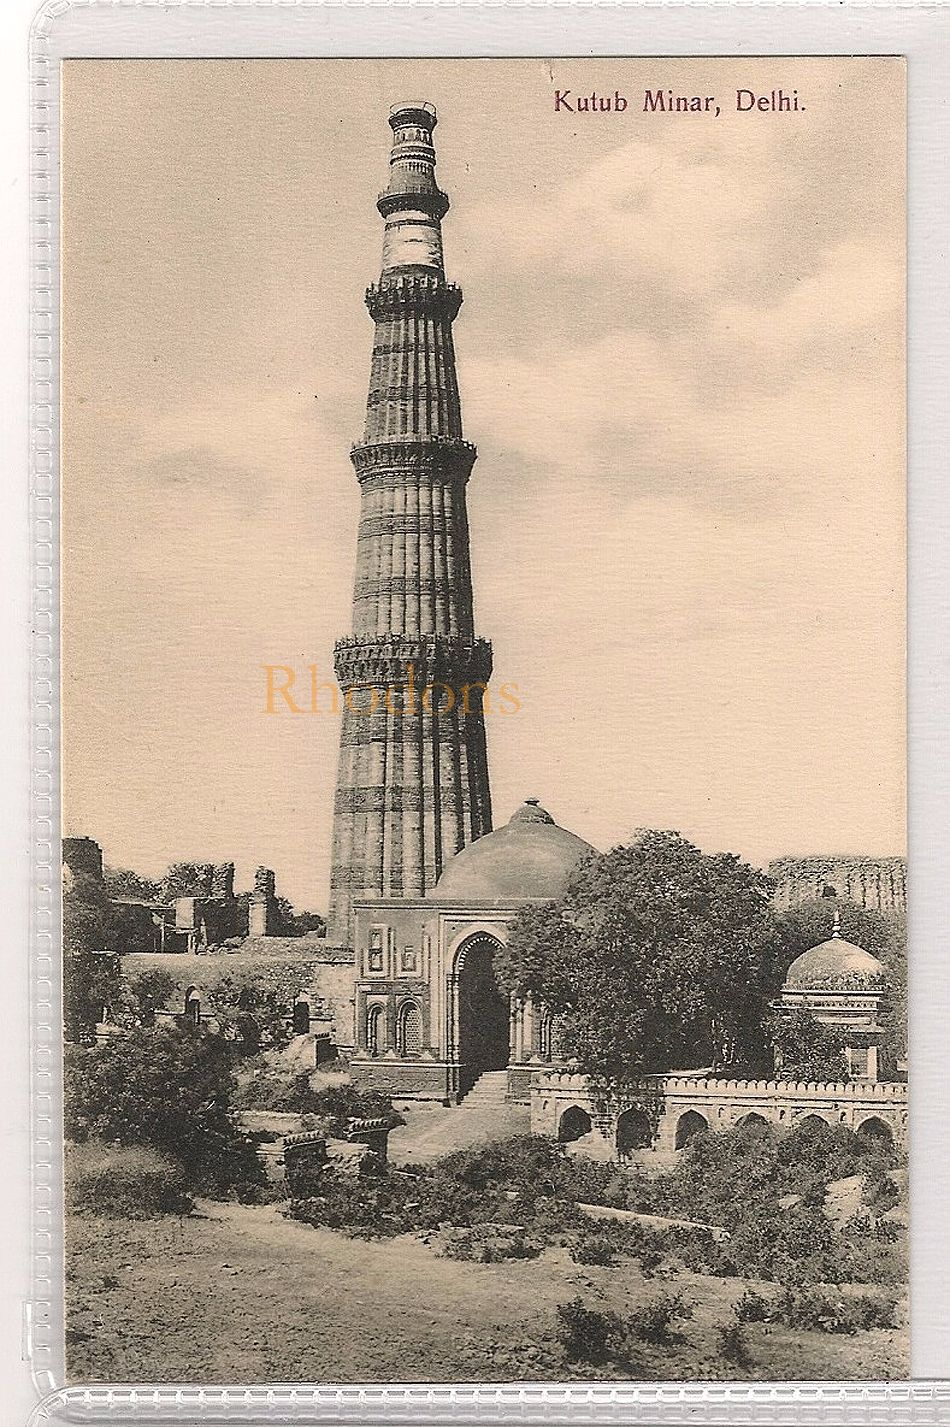 India: Kutub Minar, Delhi  Early 1900s Postcard